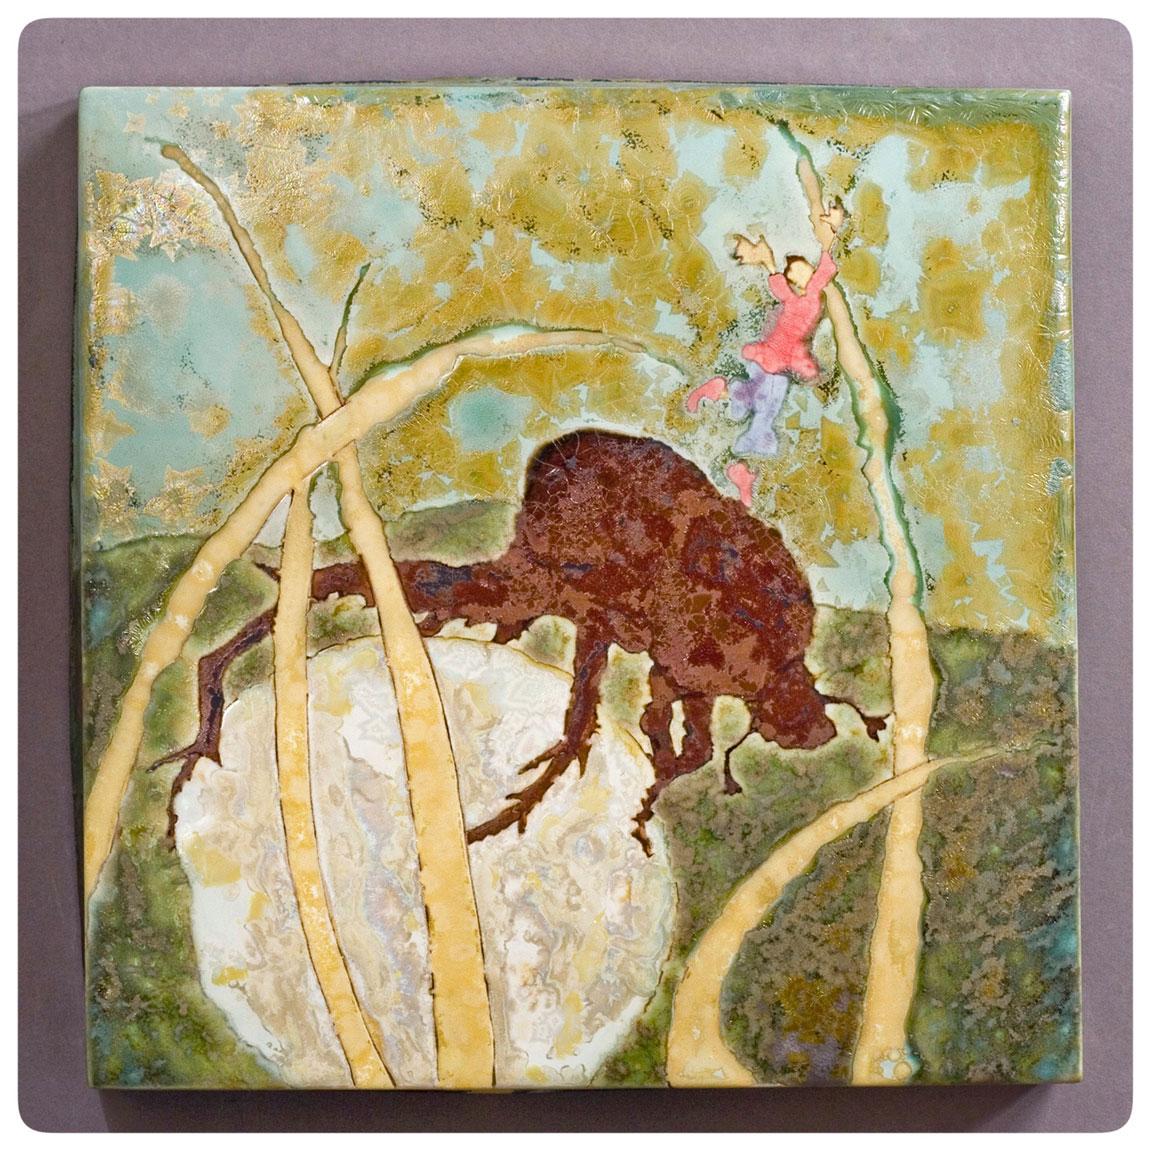 Dung Beetle and Girl Glaze Painting by Samantha Henneke | Bulldog Pottery | Seagrove | North Carolina